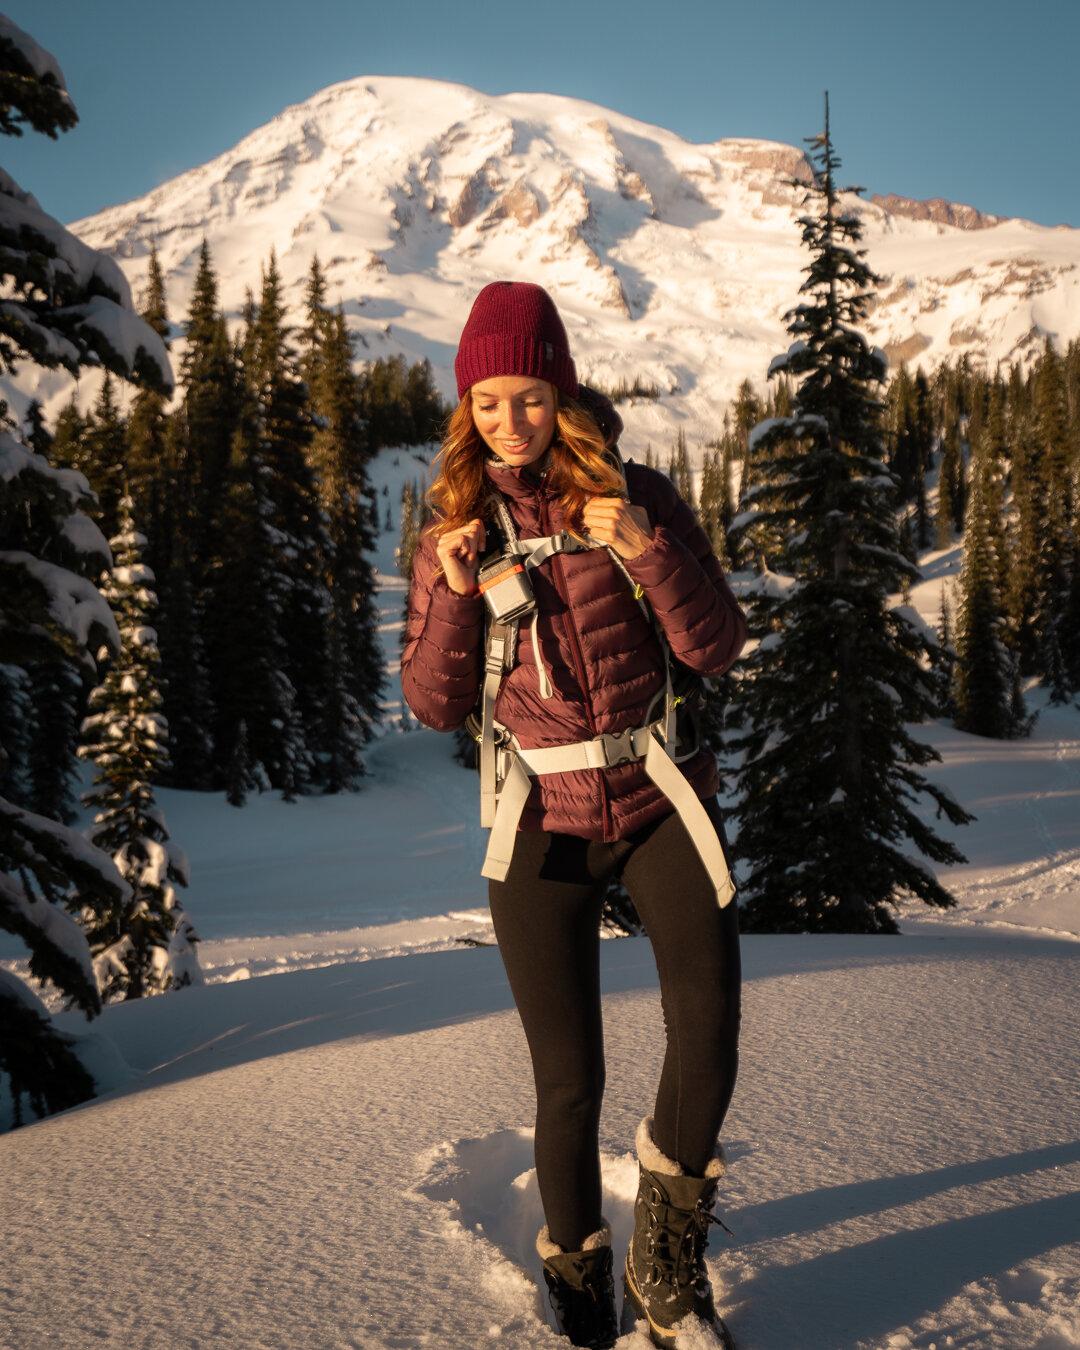 Winter hiking in Washington State at Mount Rainier. Wearing:  Winter Warm Tights ,  Sorel Boot s,  Arc'teryx Jacket , and Icebreaker Beanie.